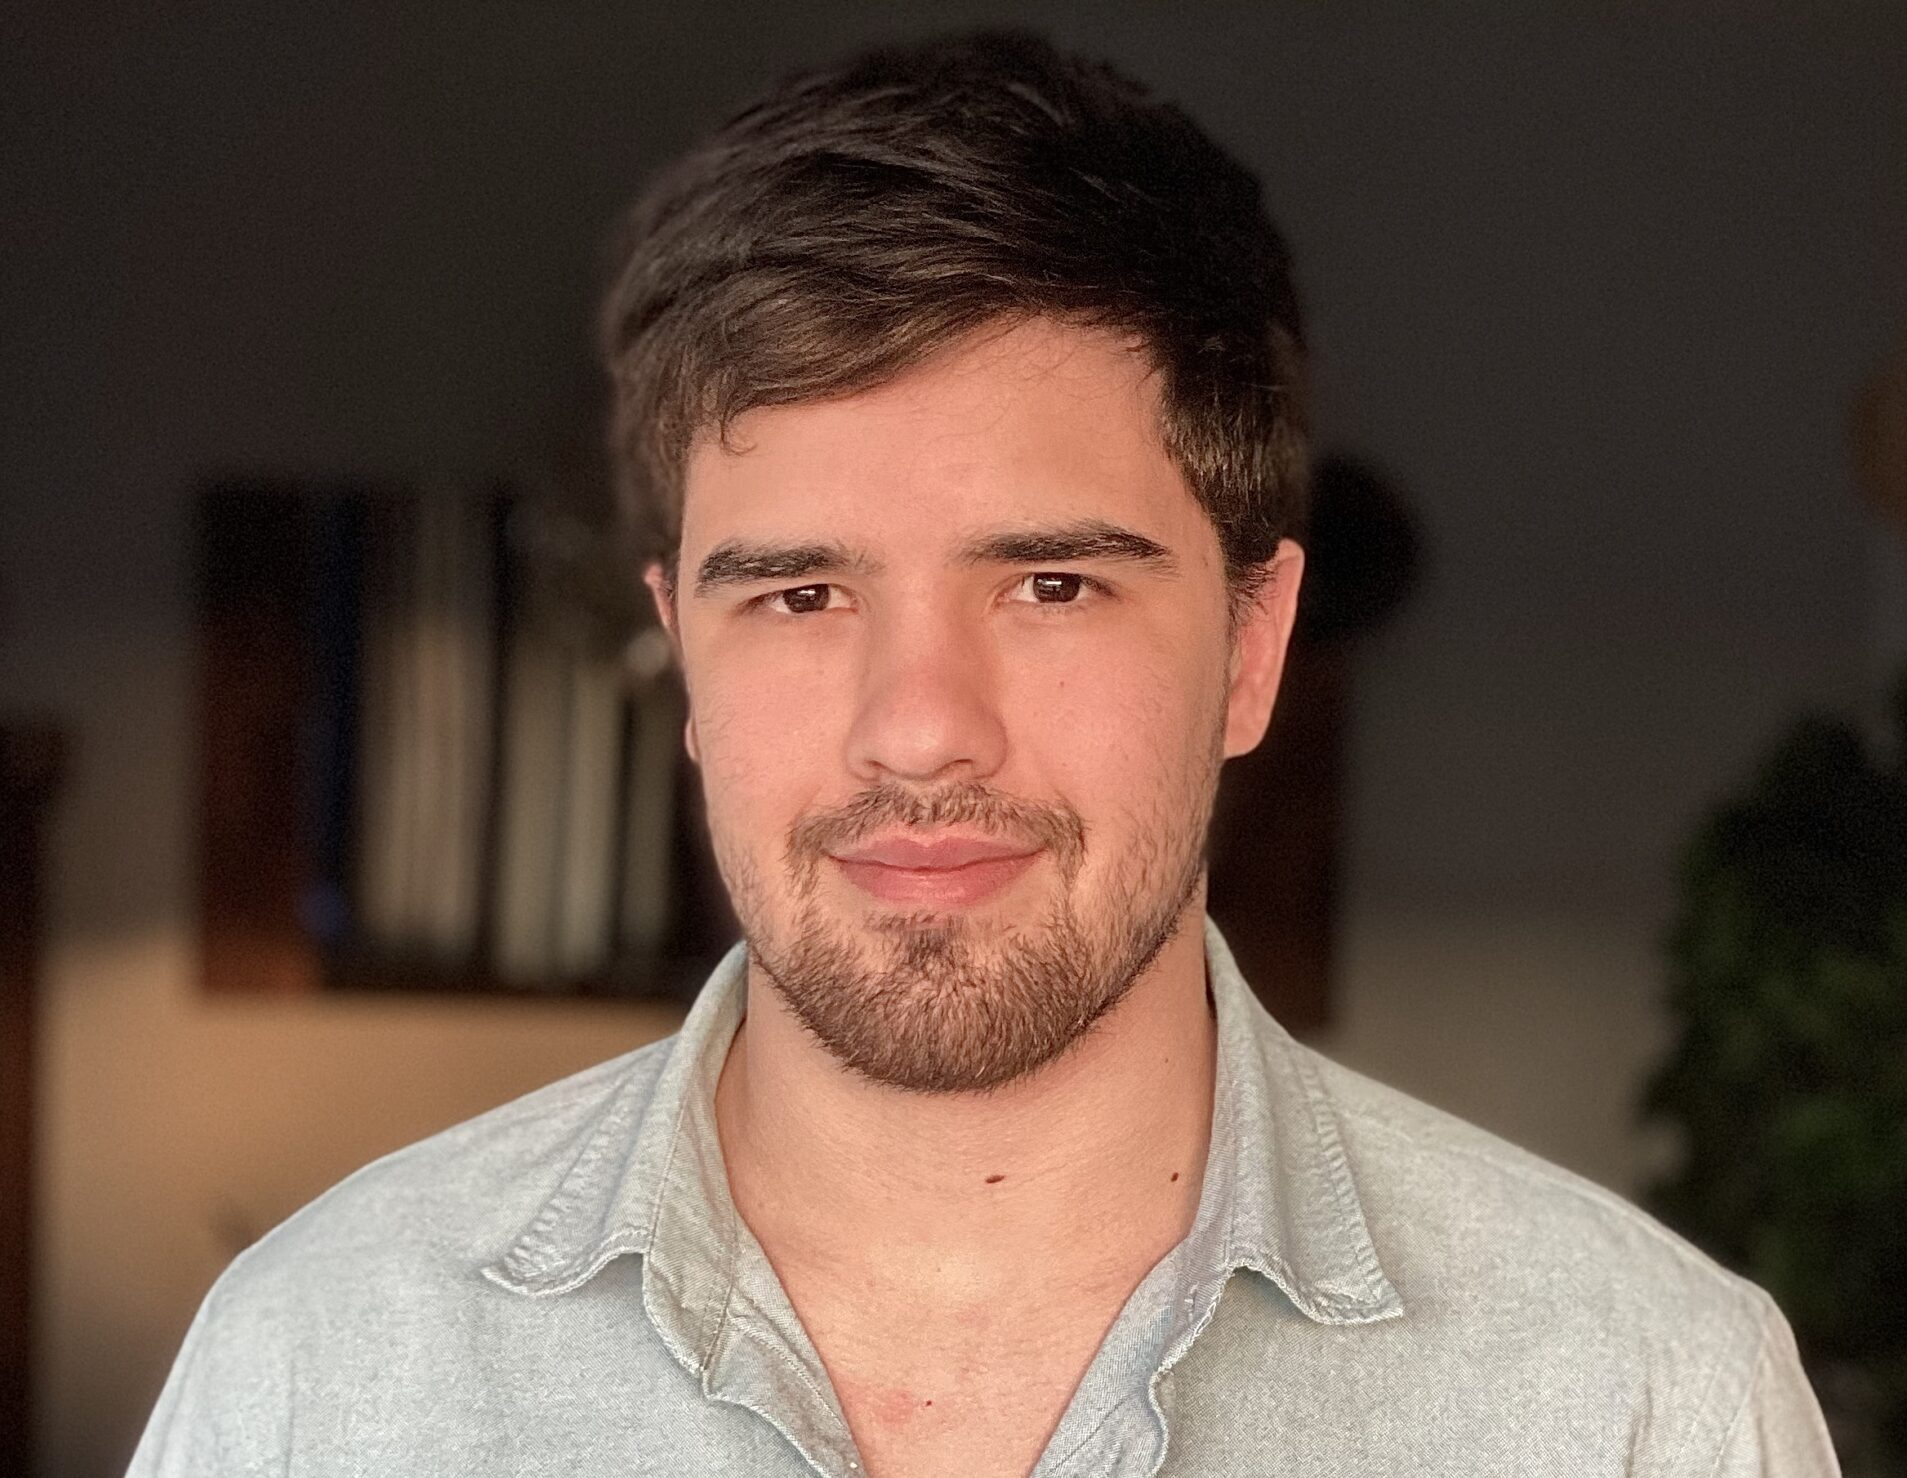 Photo of Lucas Roos, headshot